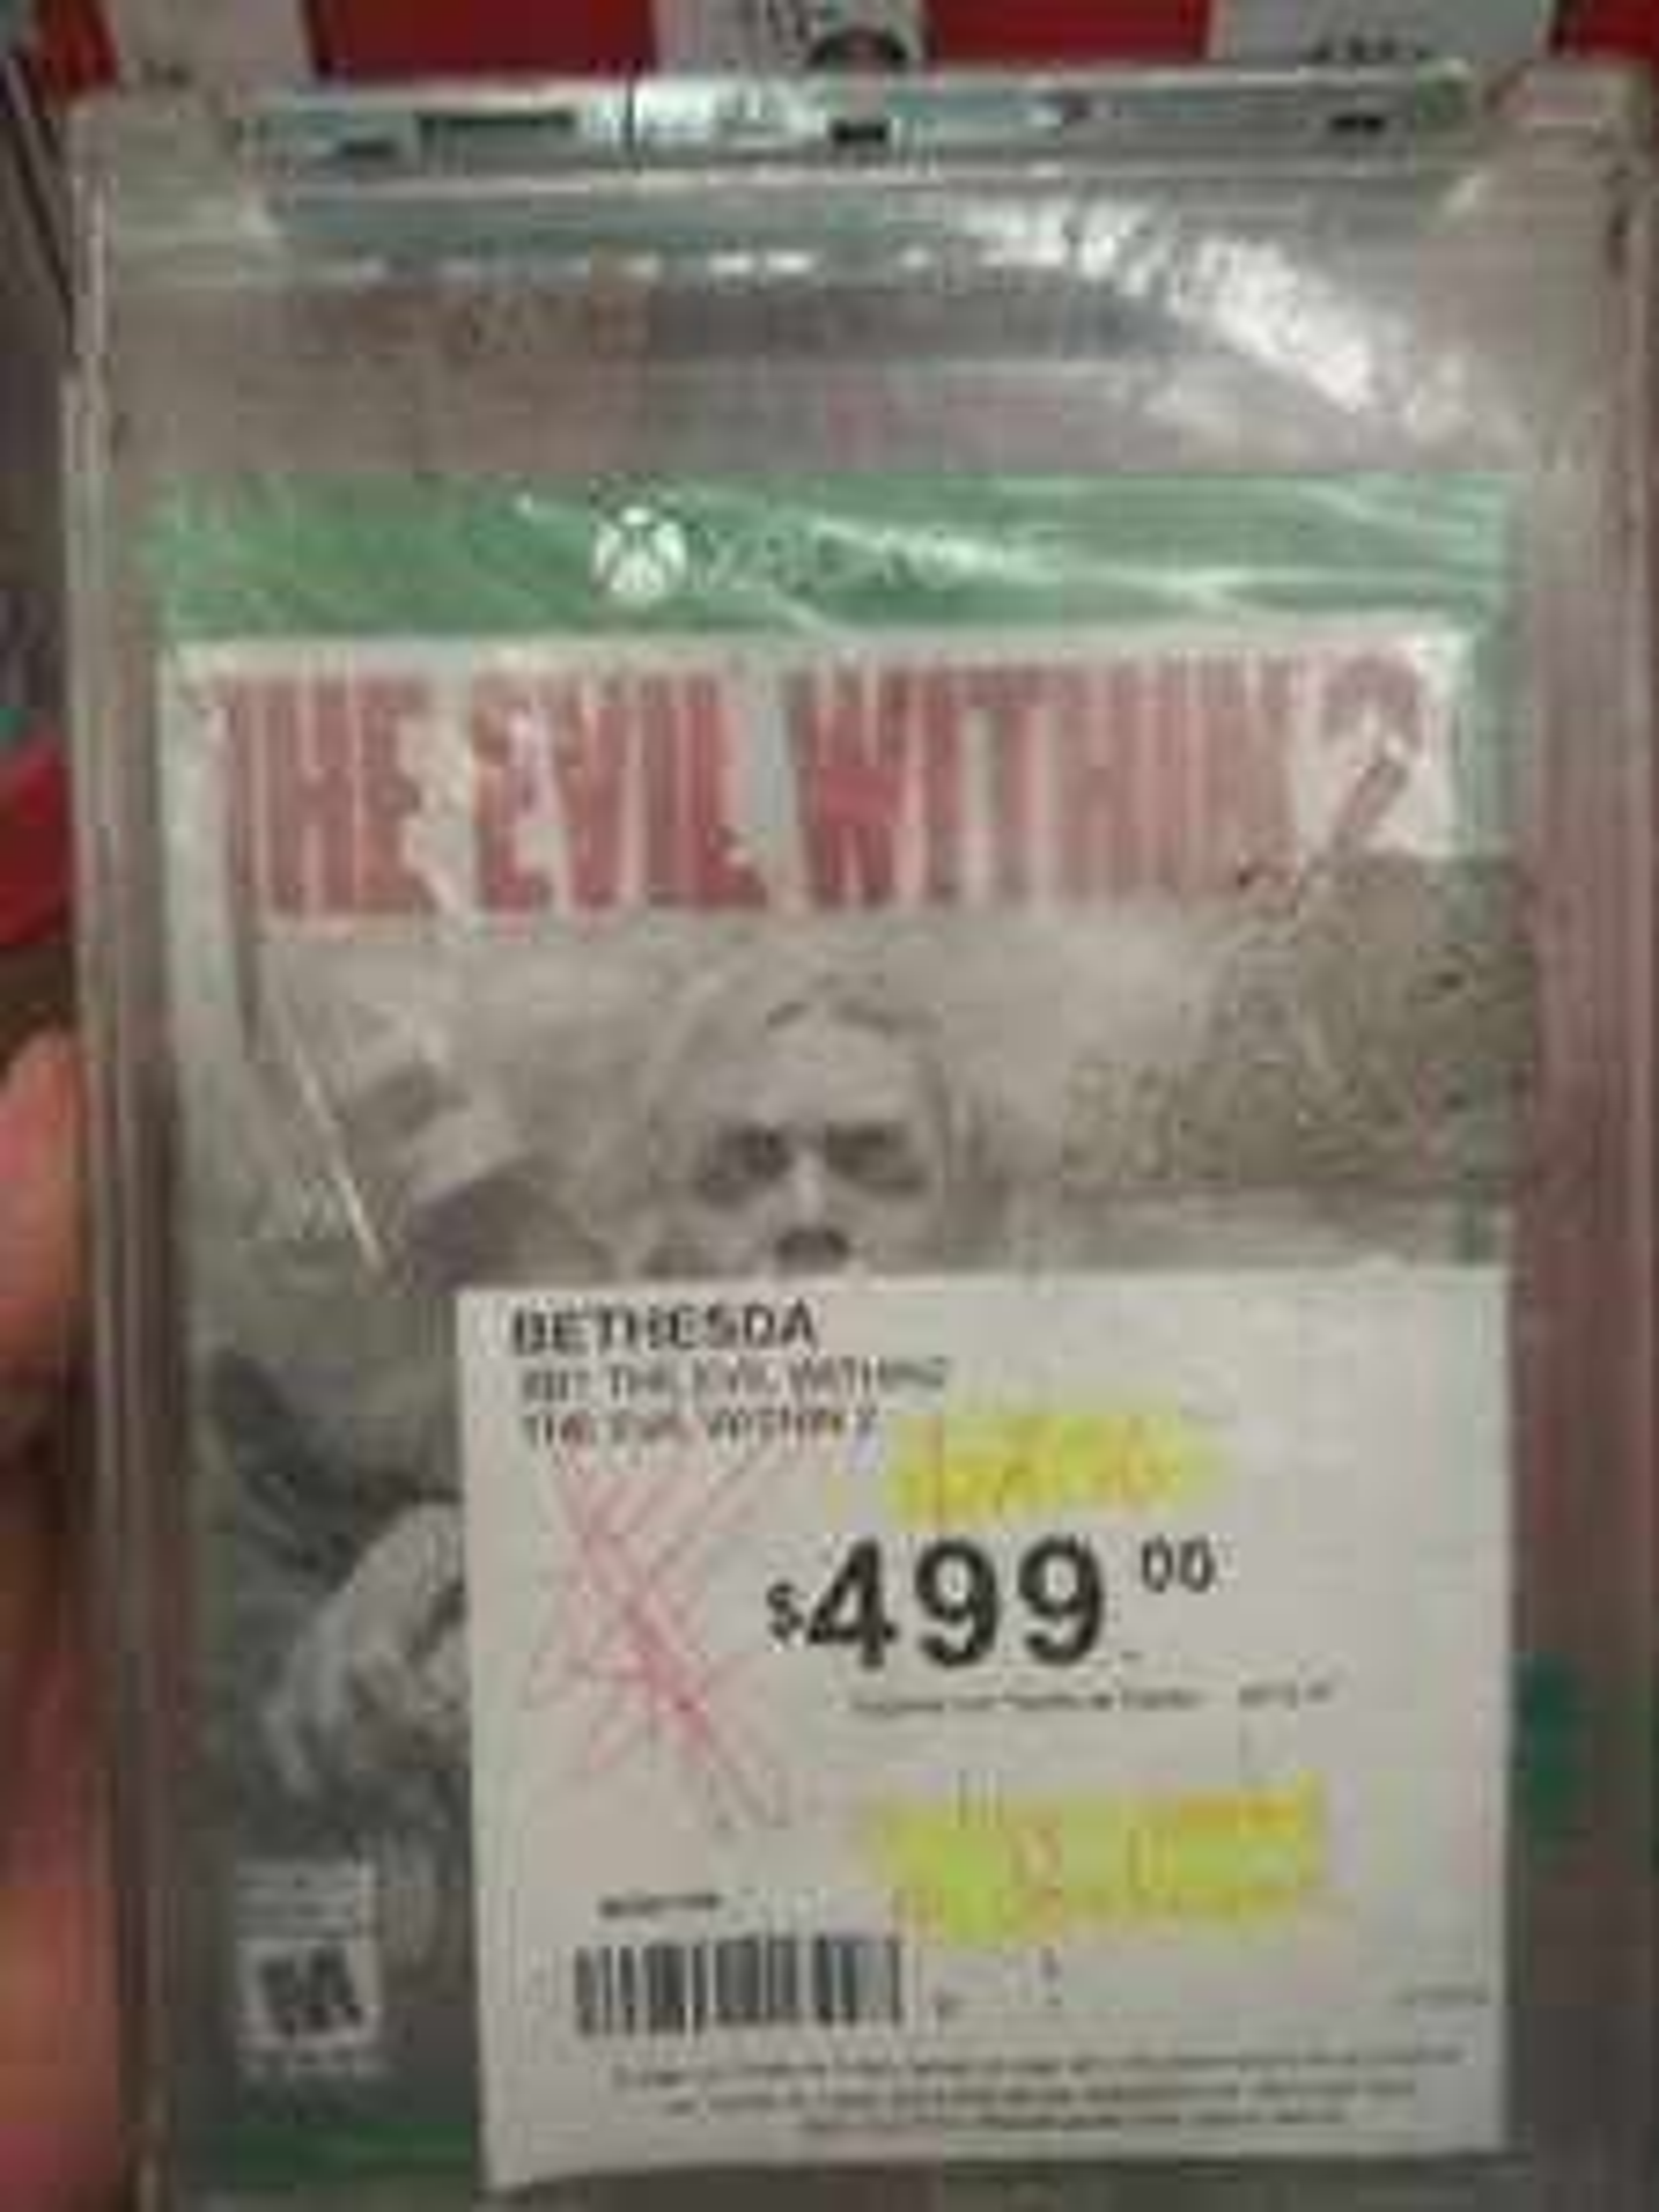 Sam's club: Xbox one evil within 2